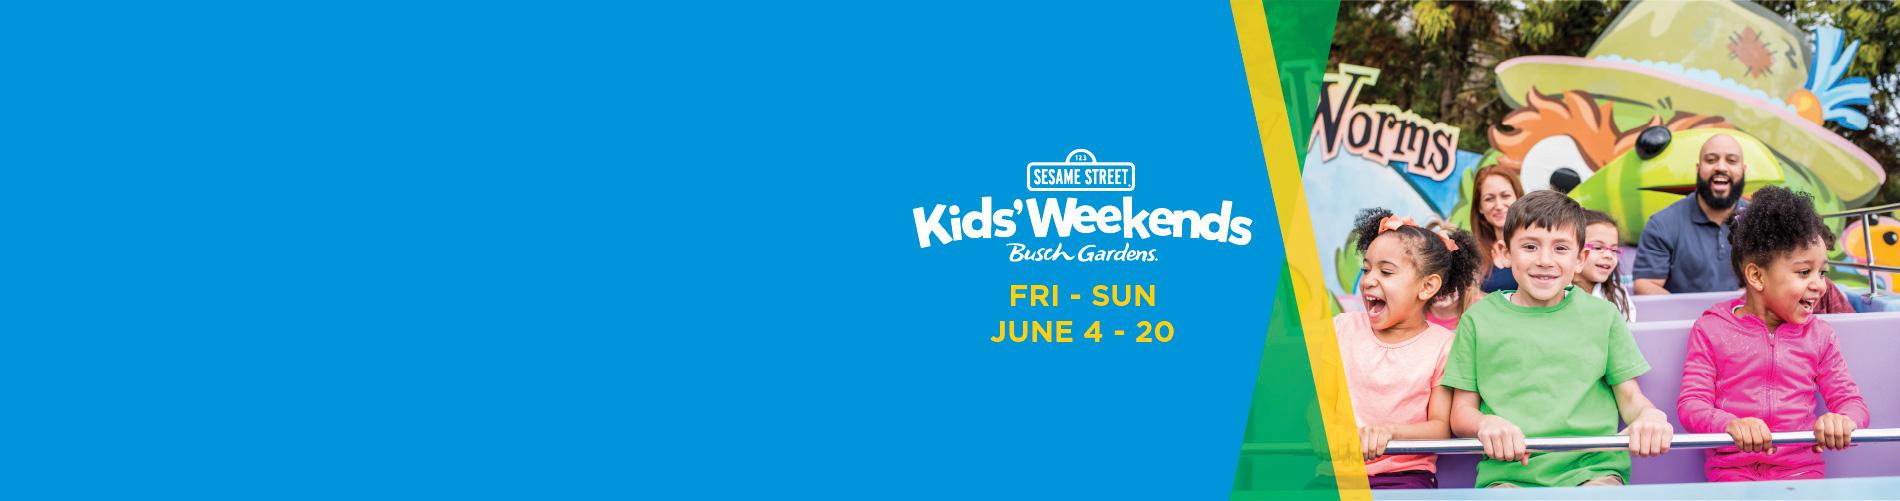 Busch Gardens Williamsburg Sesame Street Kids' Weekends